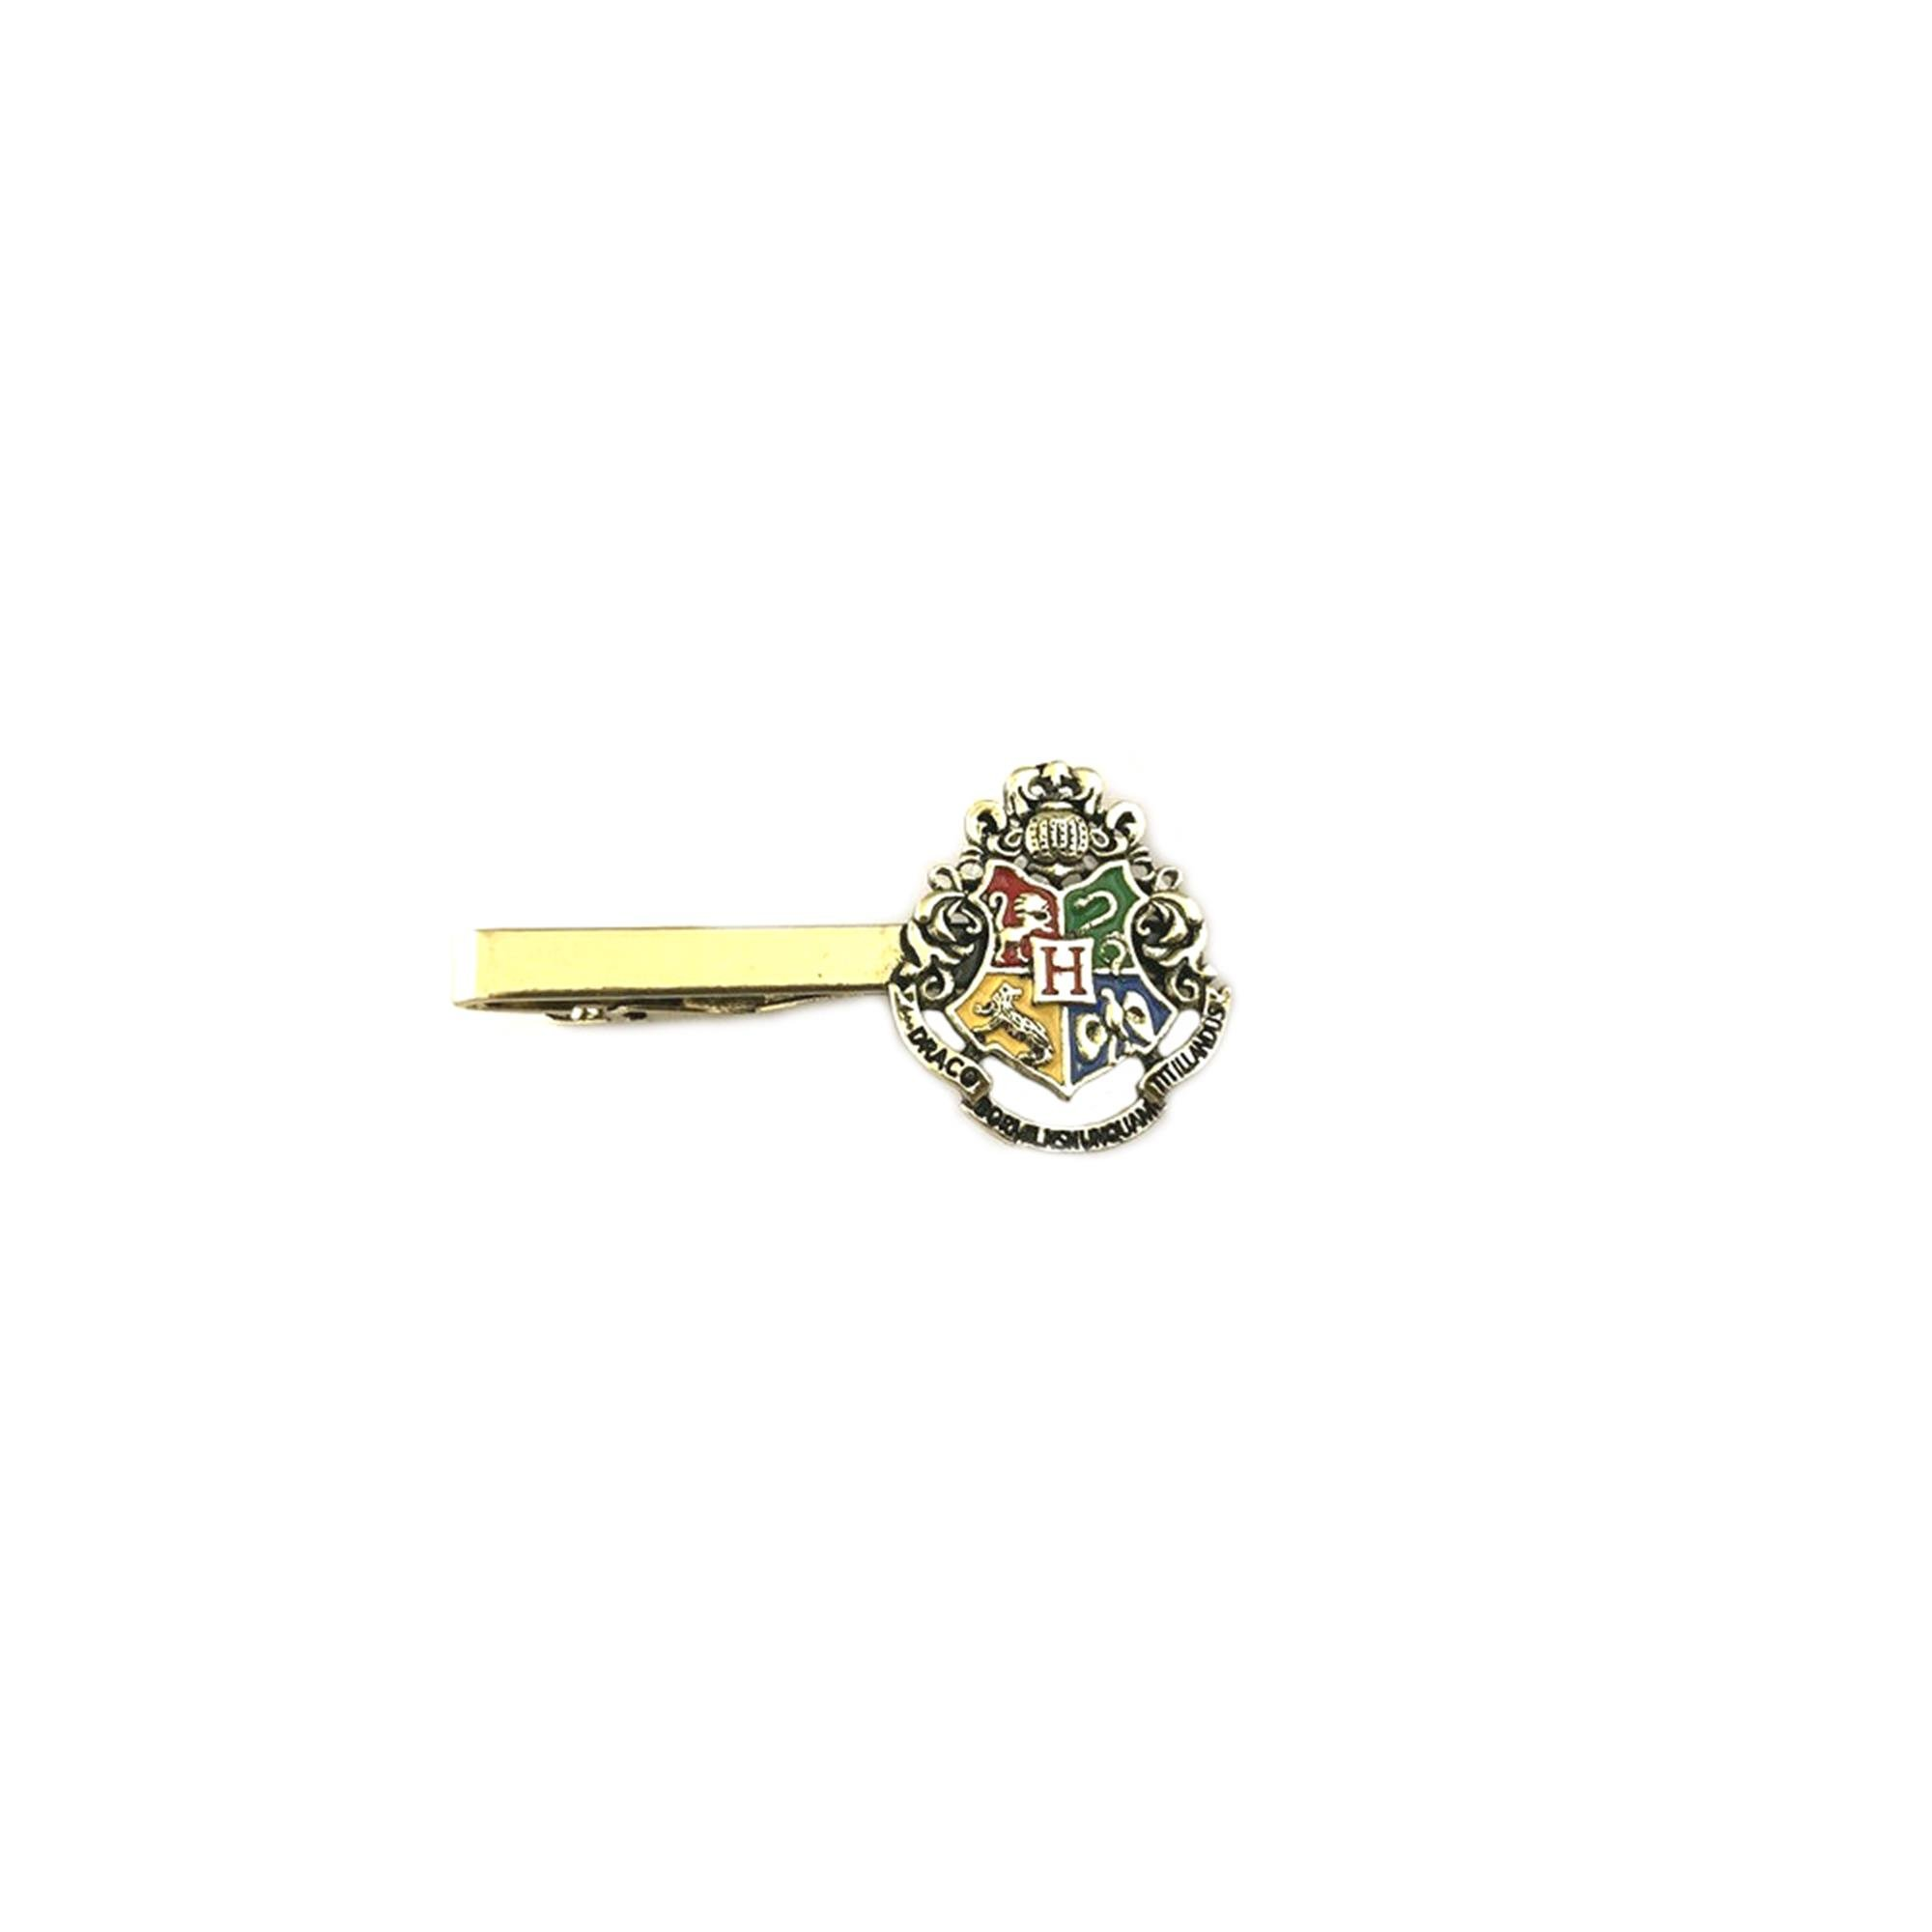 Athena Brand Movie Novel Harry Potter Hogwarts Crest Tie Bar In Gift Box